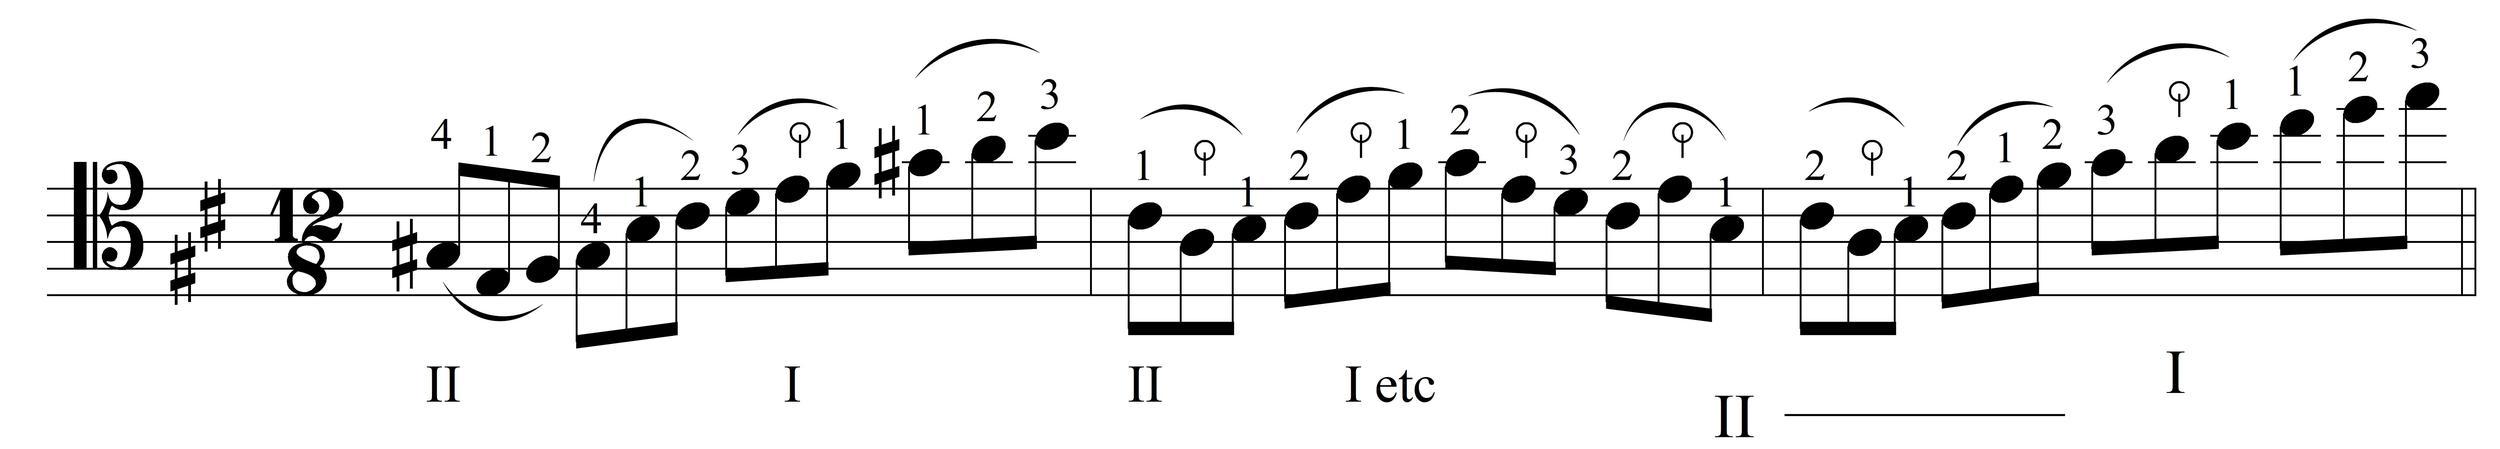 Johann Sebastian Bach, Suite No. 6 in D Major BWV 1012,  Prelude,  mm. 67-69